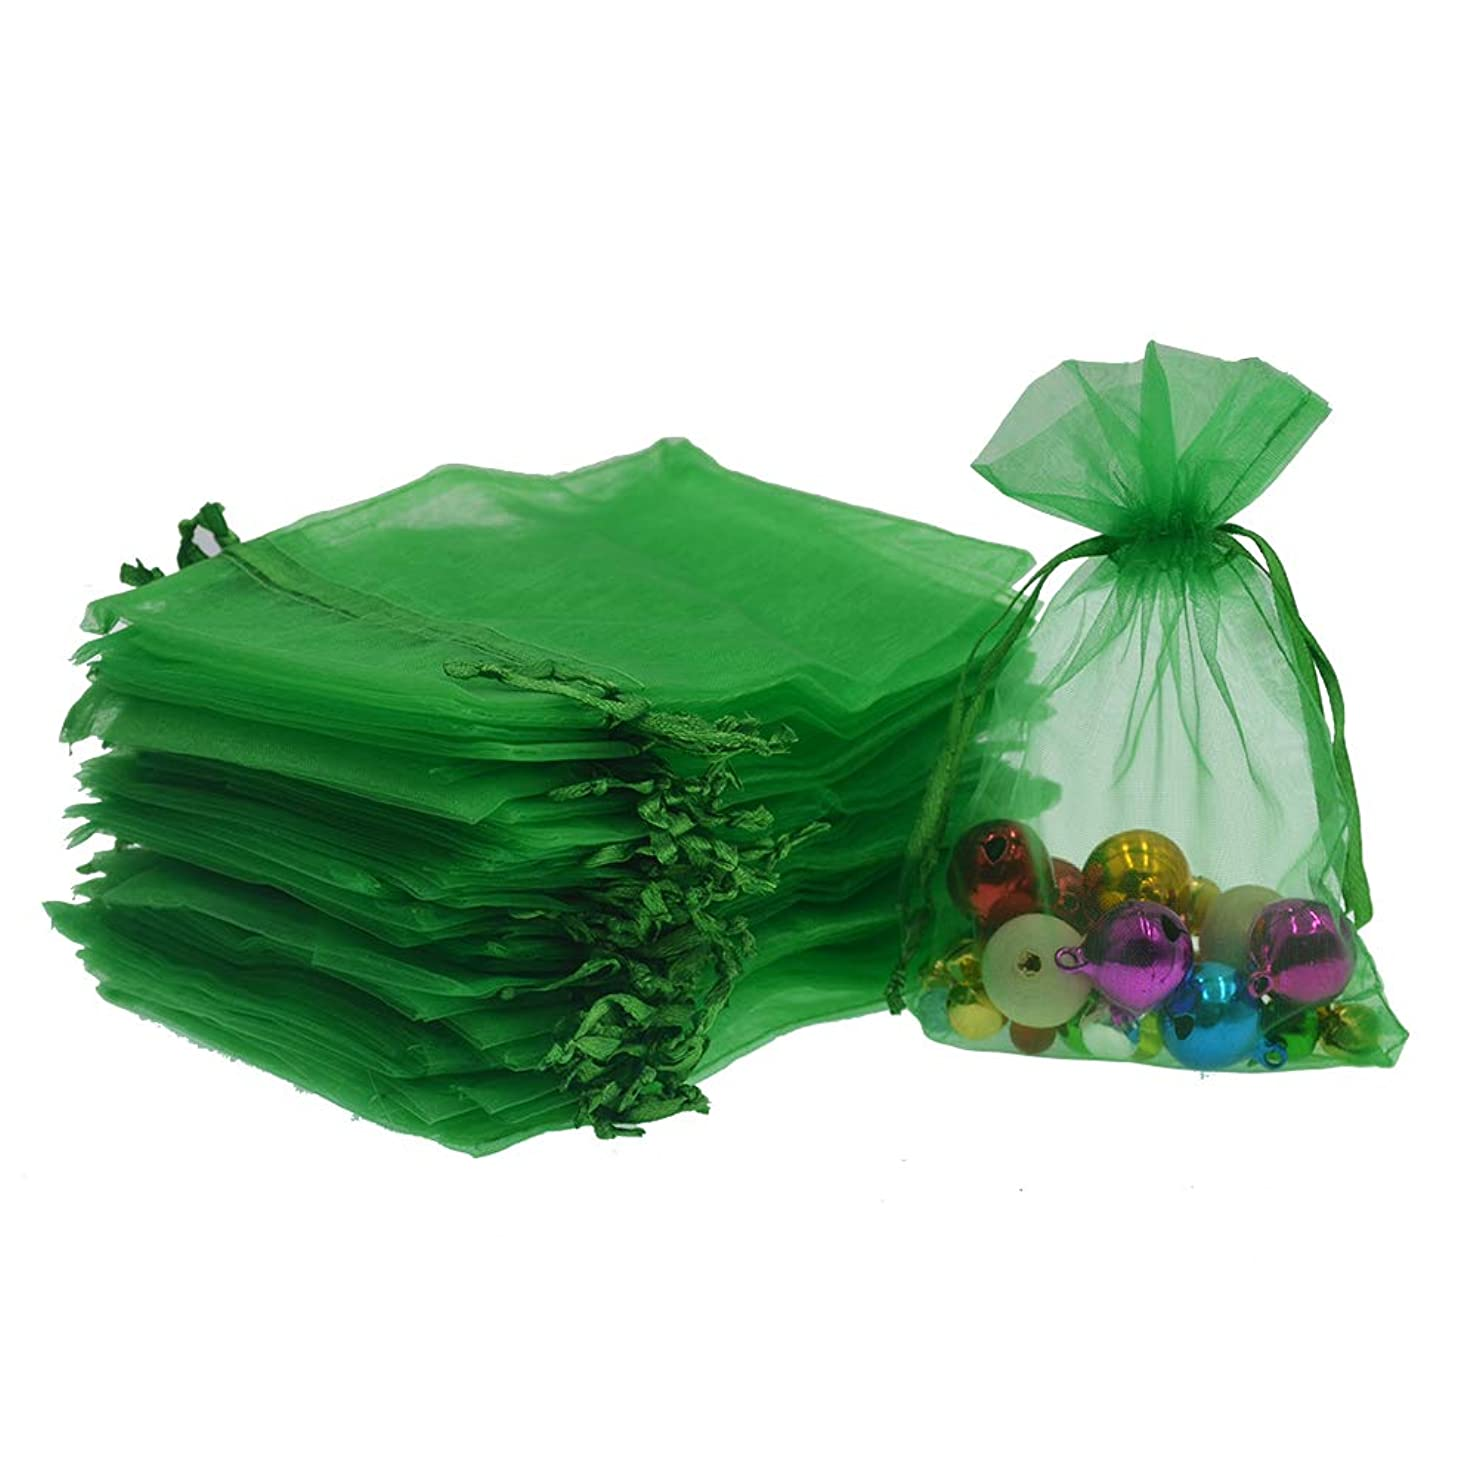 Lautechco 100Pcs Organza Bags 3x4 inches Green Organza Gift Bags Small Mesh Bags Drawstring Gift Bags Christmas Drawstring Organza Gift Bags (3x4 inches Green)